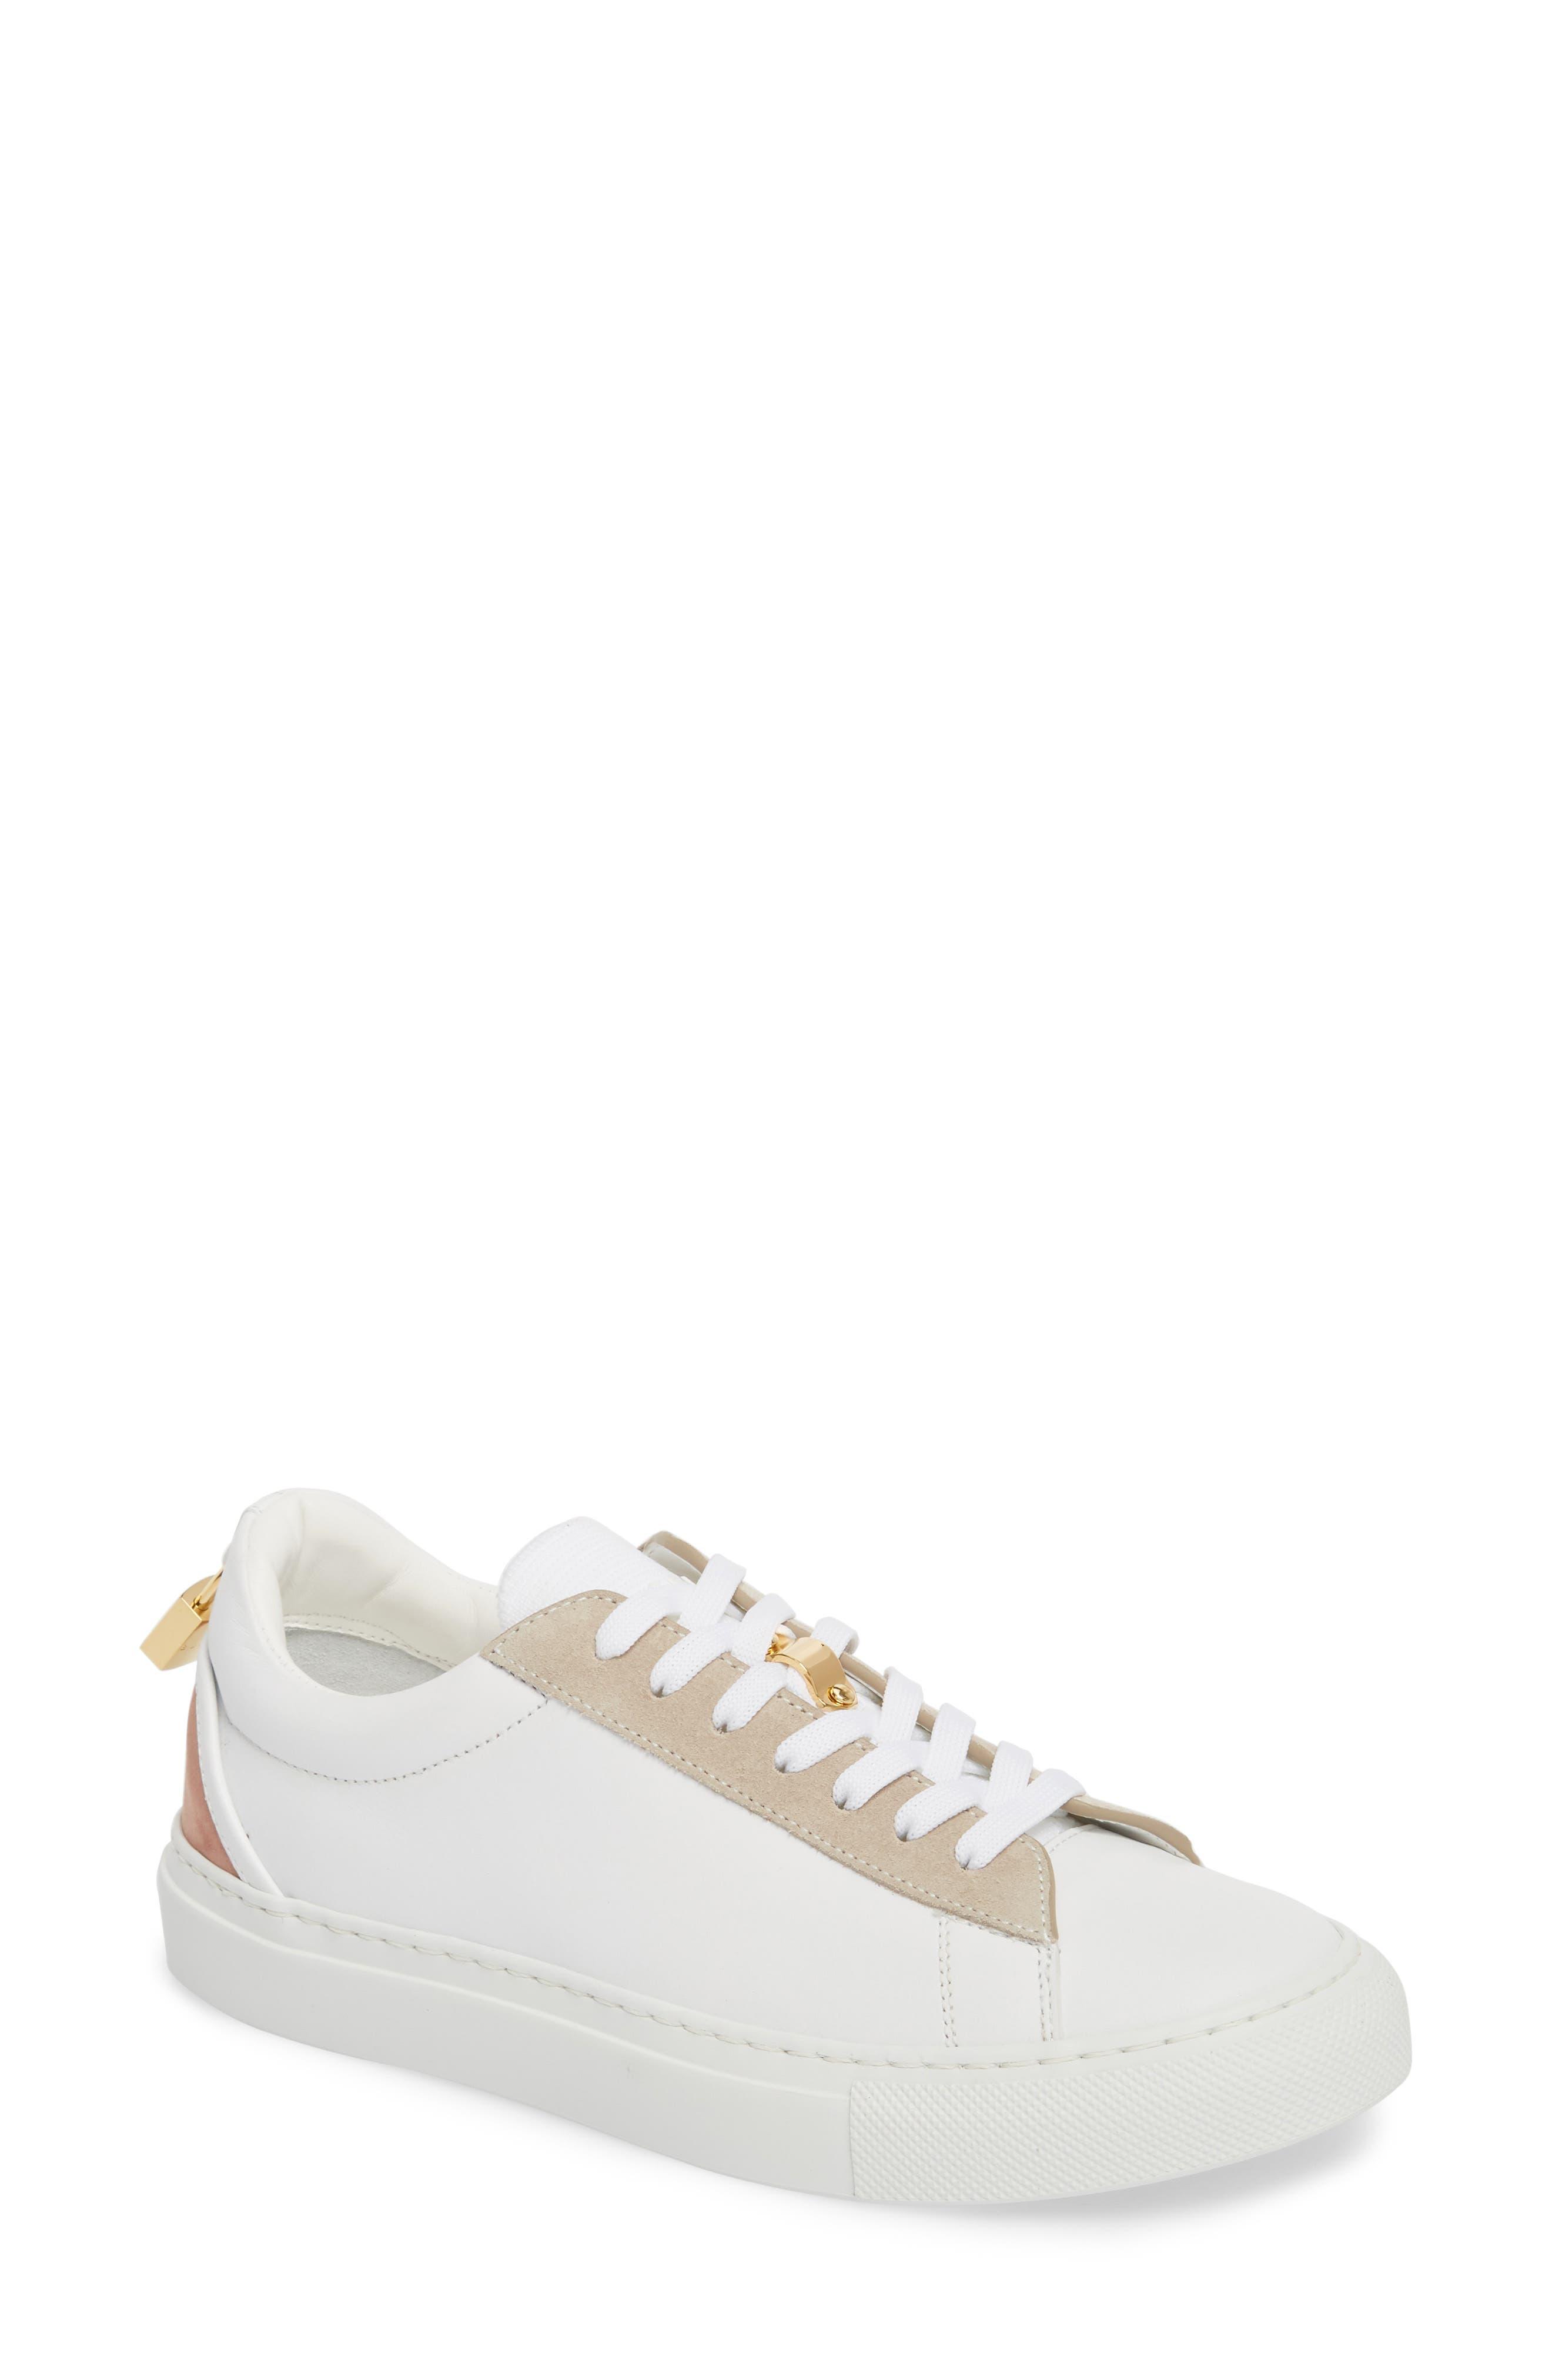 Tennis Lock Sneaker,                         Main,                         color, White/ Dusty Pink